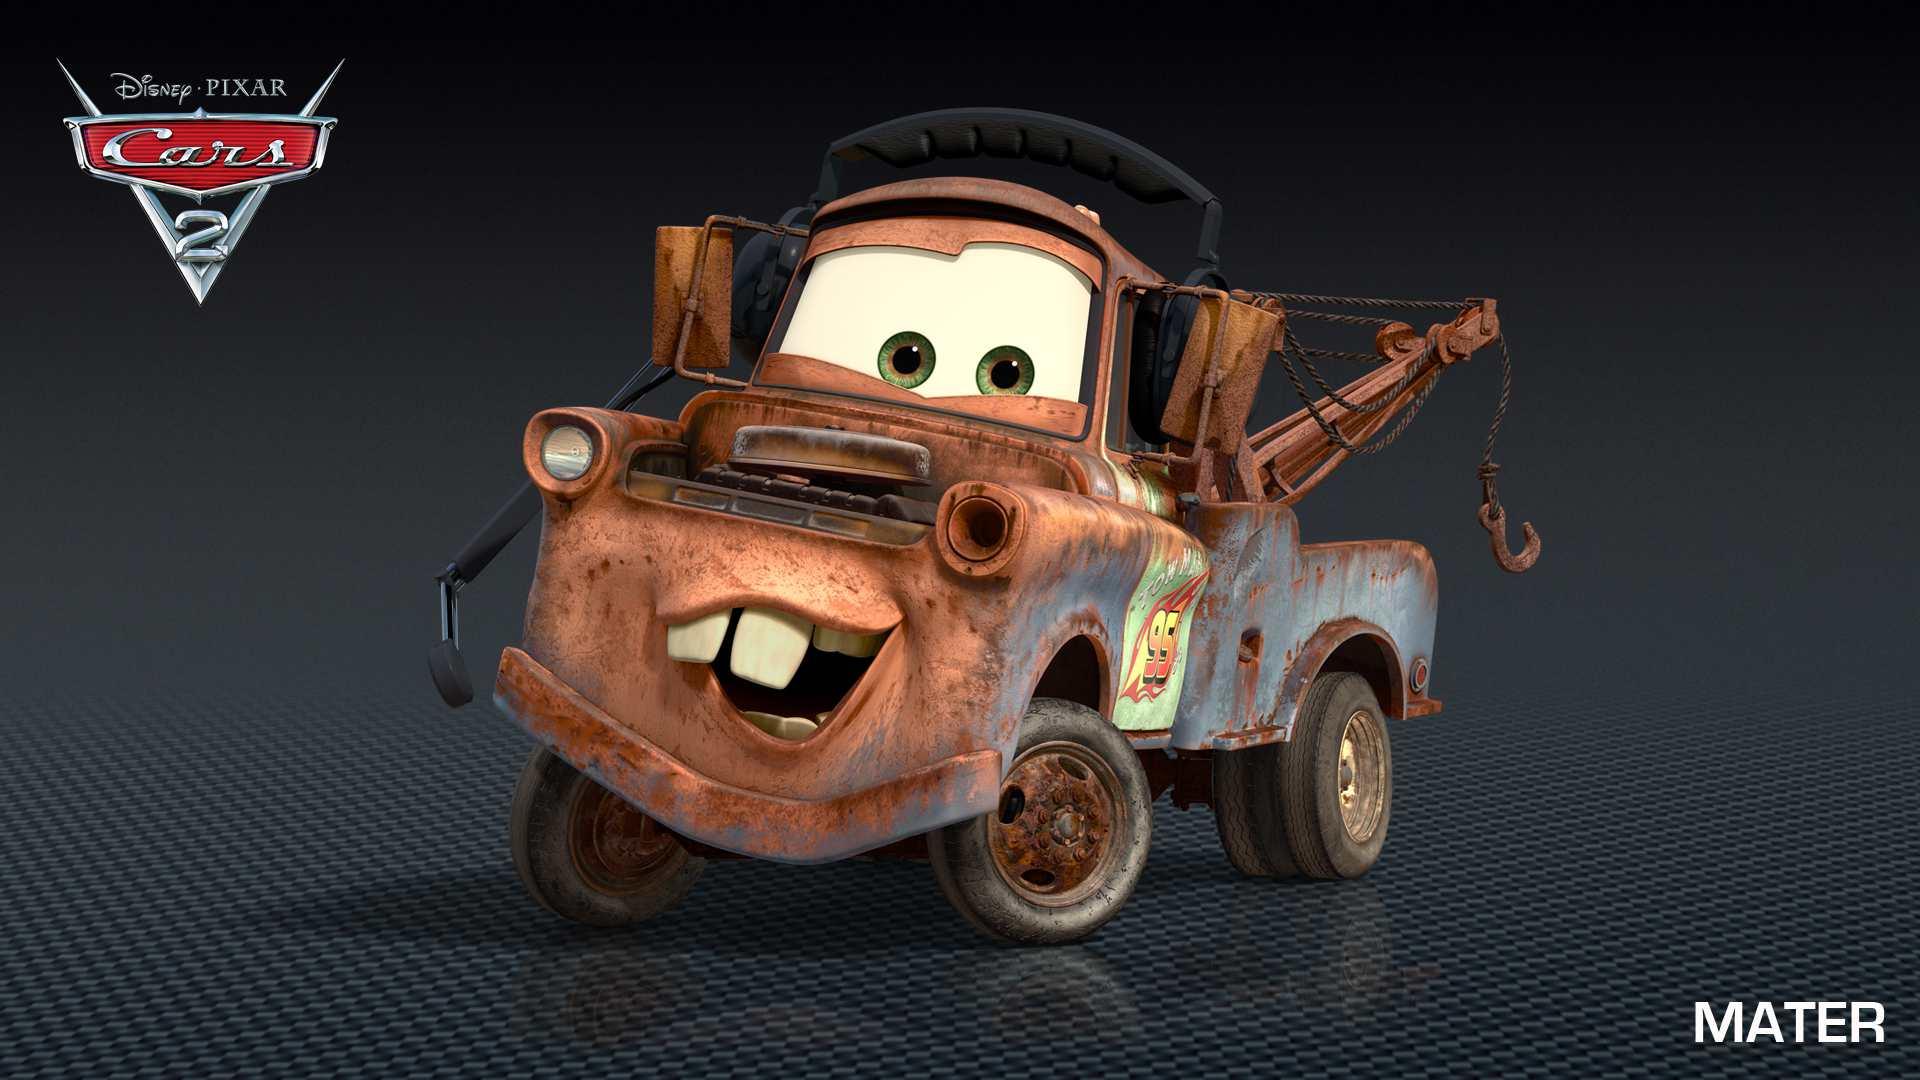 cars 2 characters - characters in disney pixar cars 2